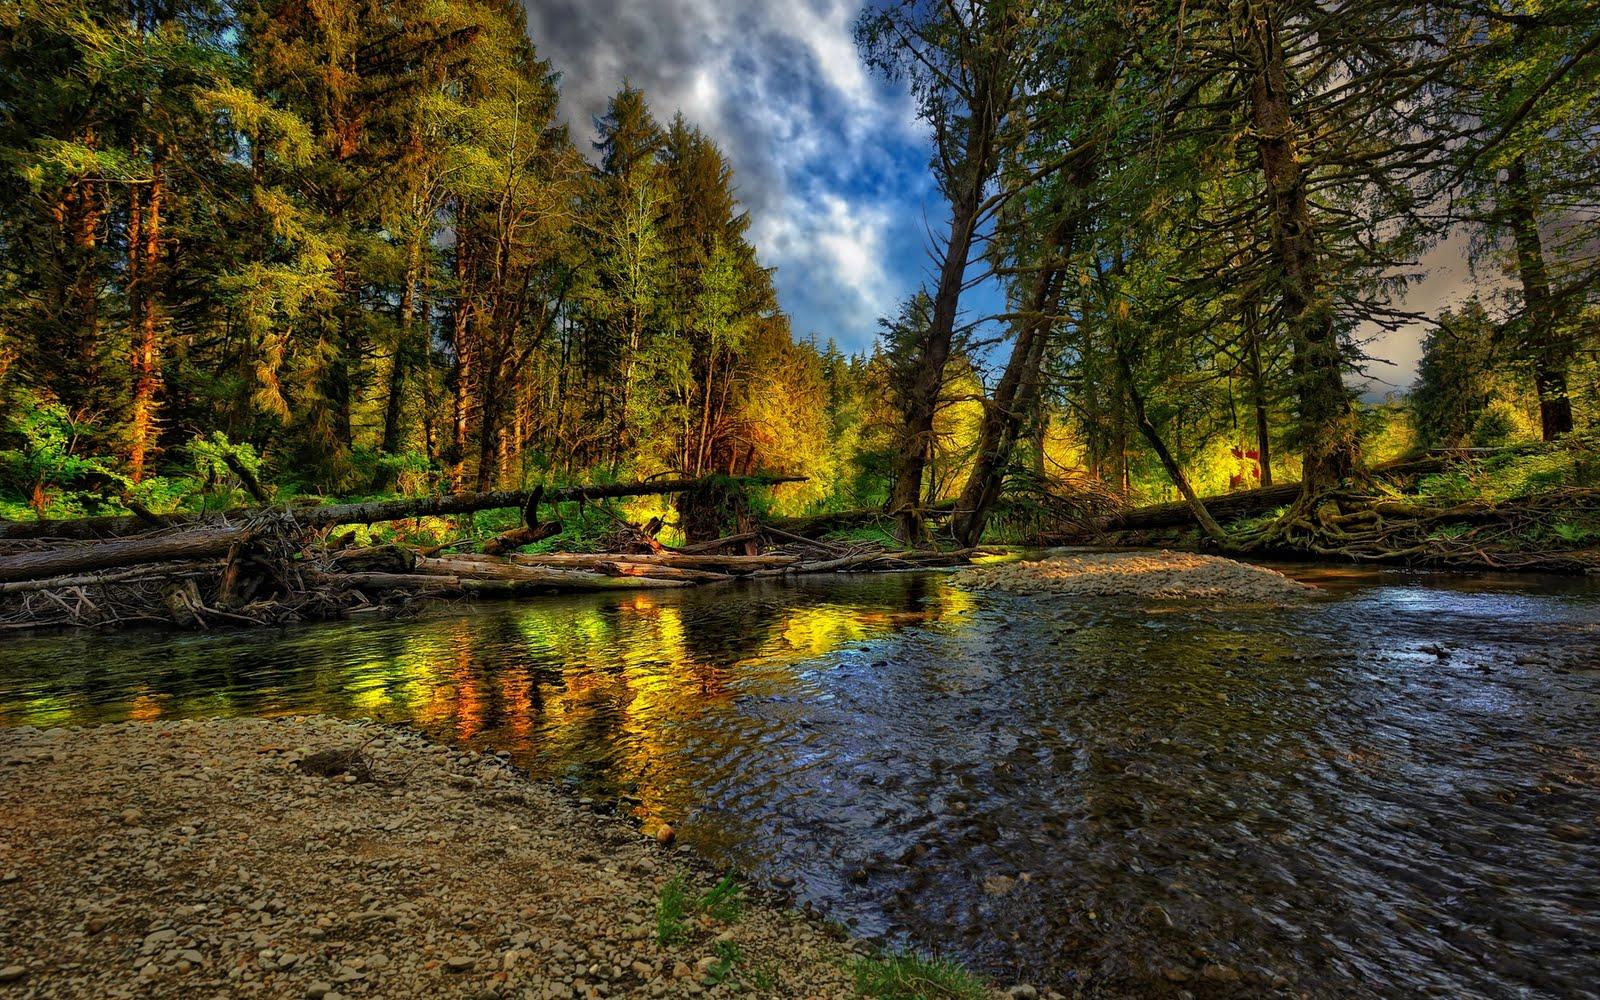 http://1.bp.blogspot.com/-_QWlWMJR9Uw/TqLwxSLrtFI/AAAAAAAAnzY/ZbmLcvvAZjw/s1600/rio-en-el-bosque-forest-hdr-1920x1200-wallpaper.jpg